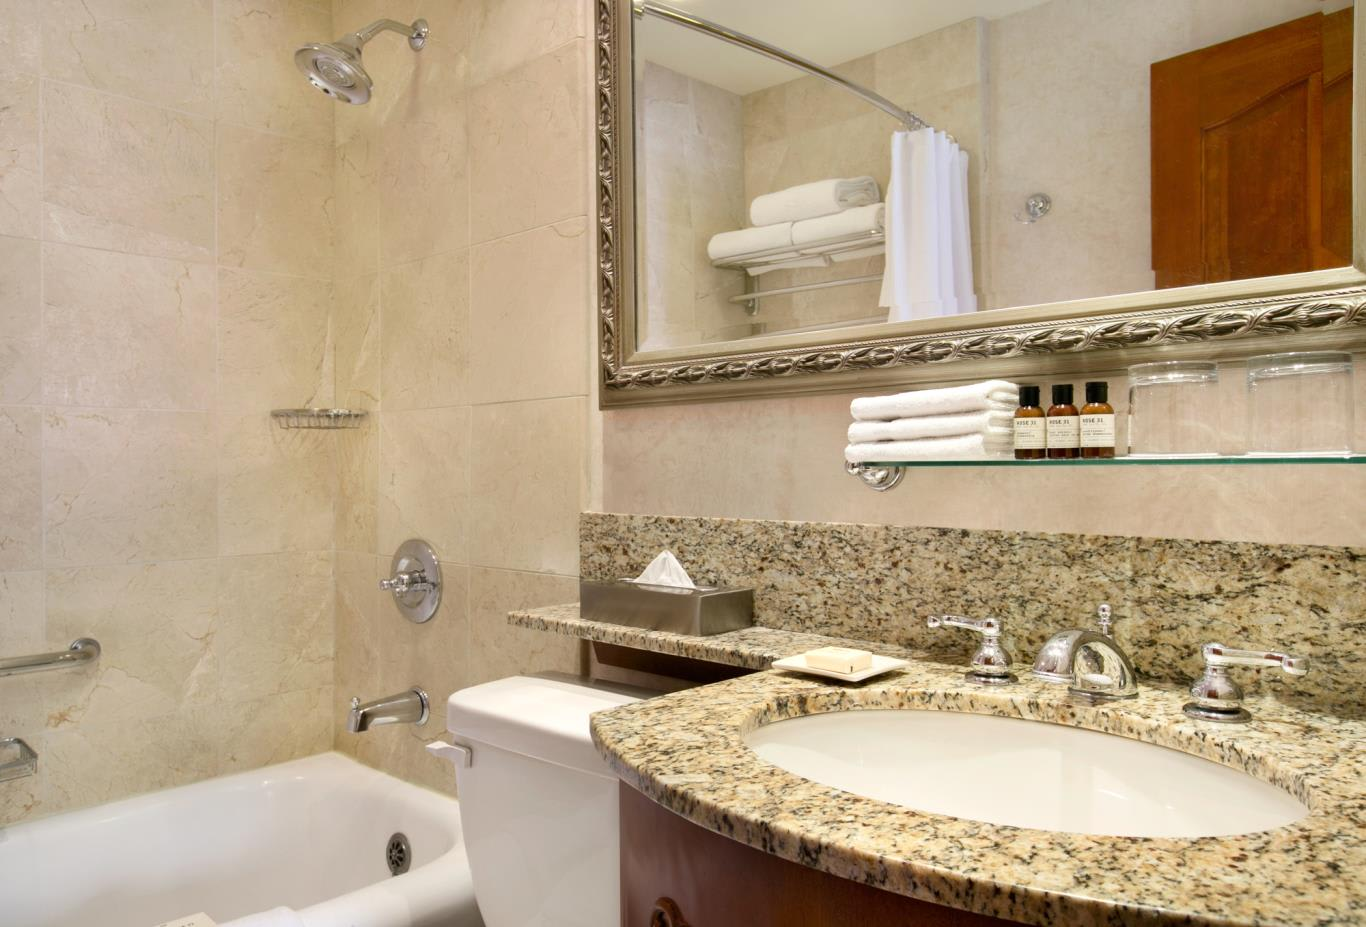 Fairmont Bathroom